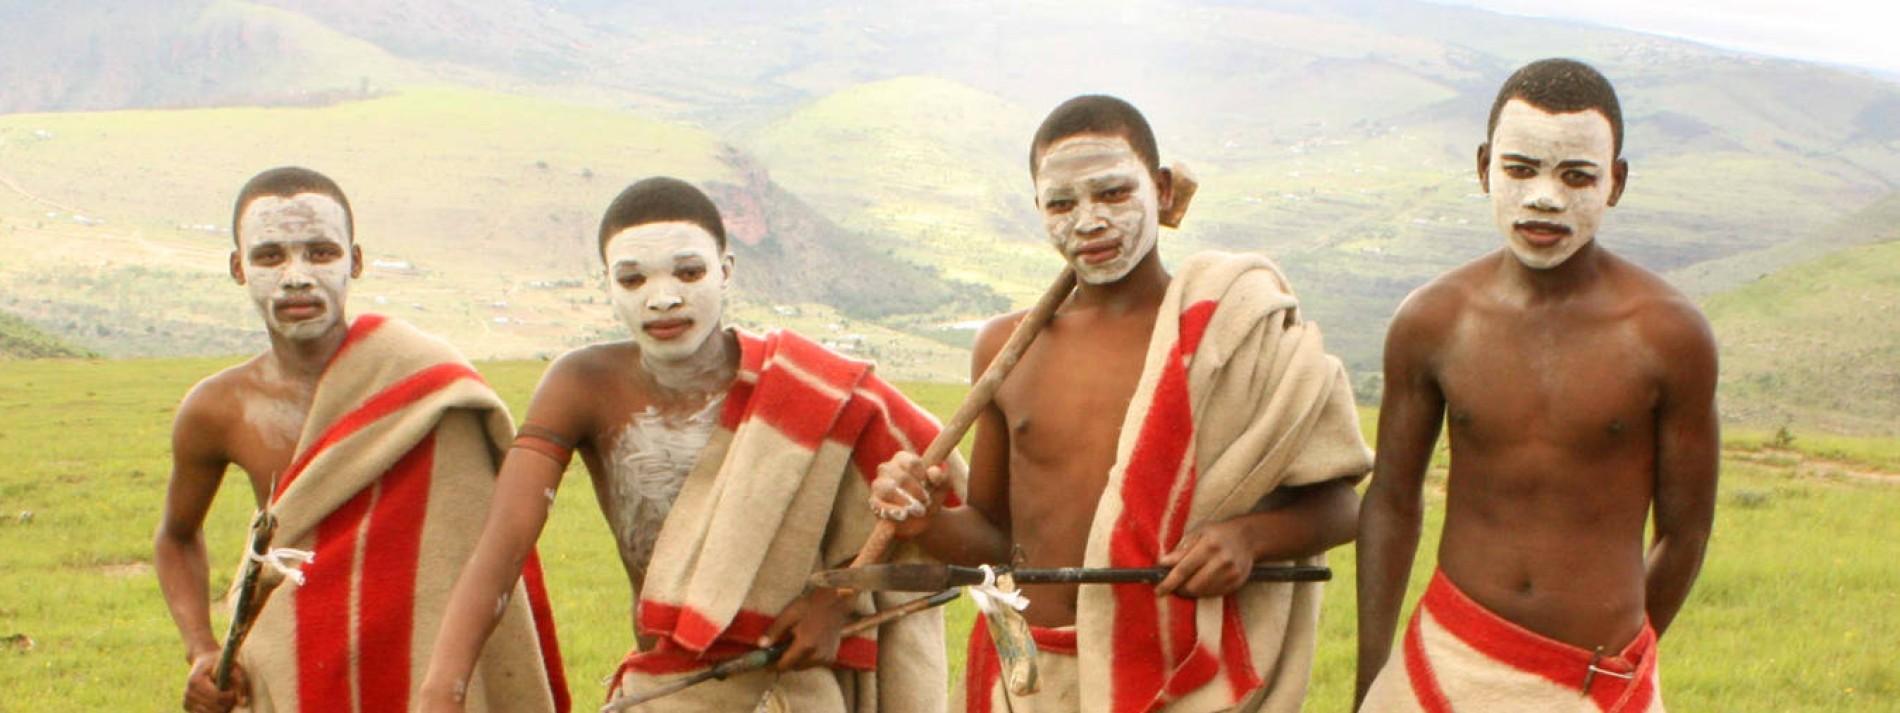 nackt xhosa madchen